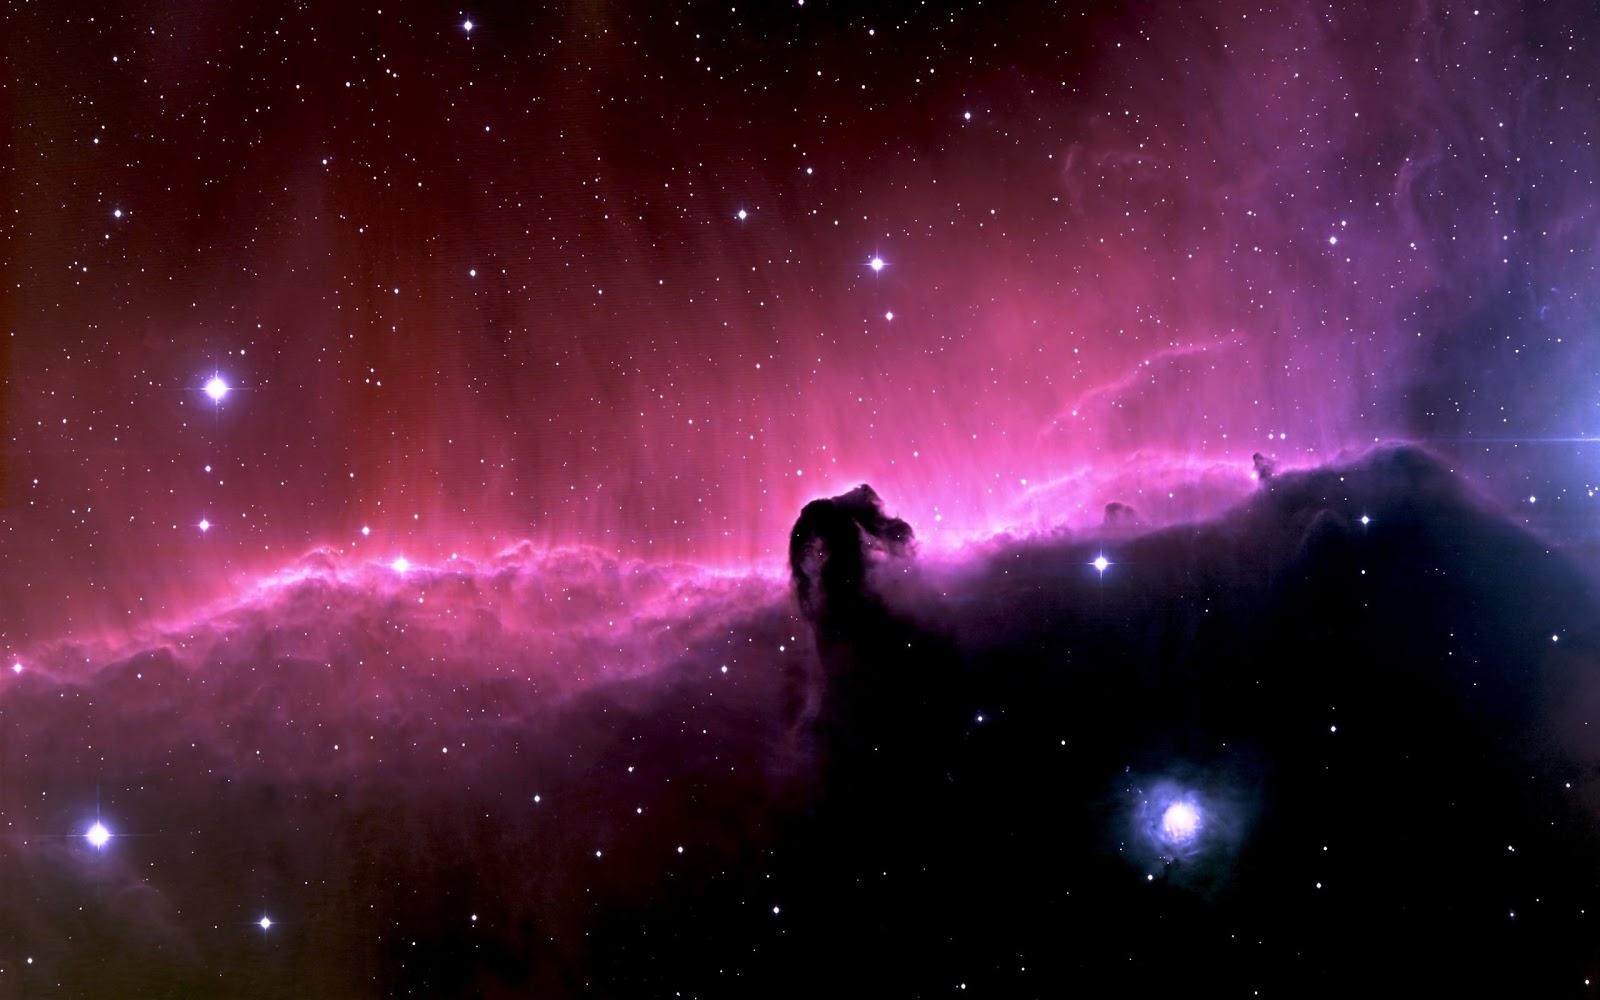 Good   Wallpaper Horse Nebula - Horsehead-Nebula-Wallpaper-HD-03  You Should Have_152118.jpg